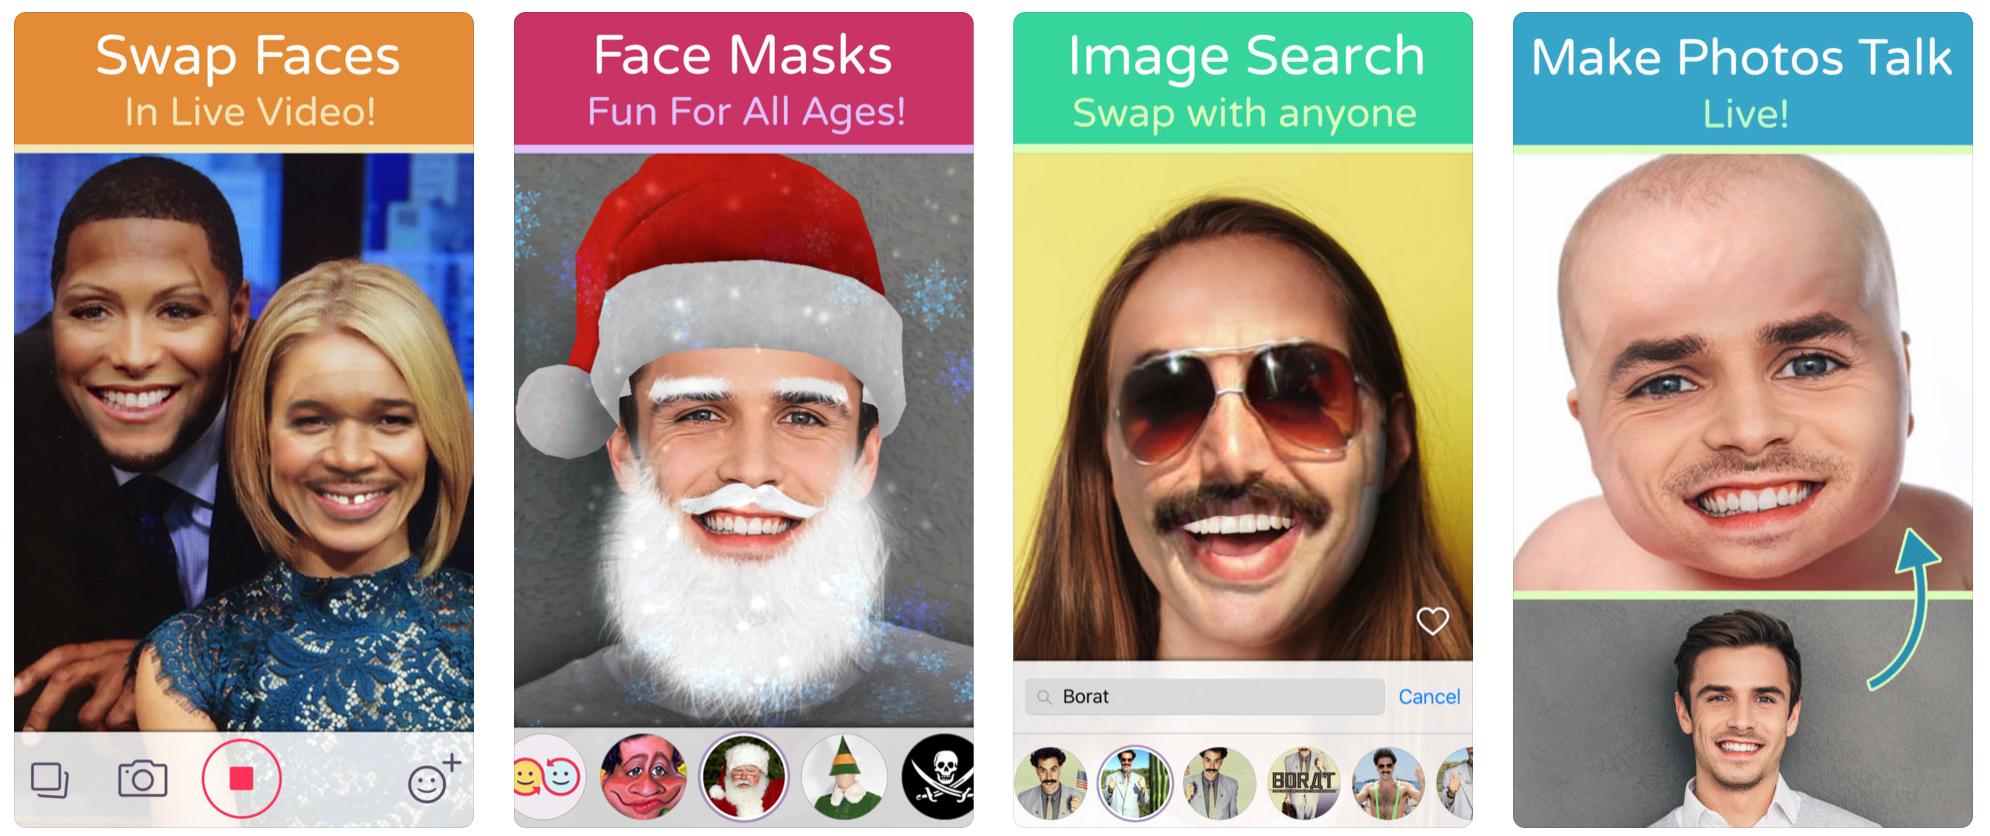 Face Swap camera face filters